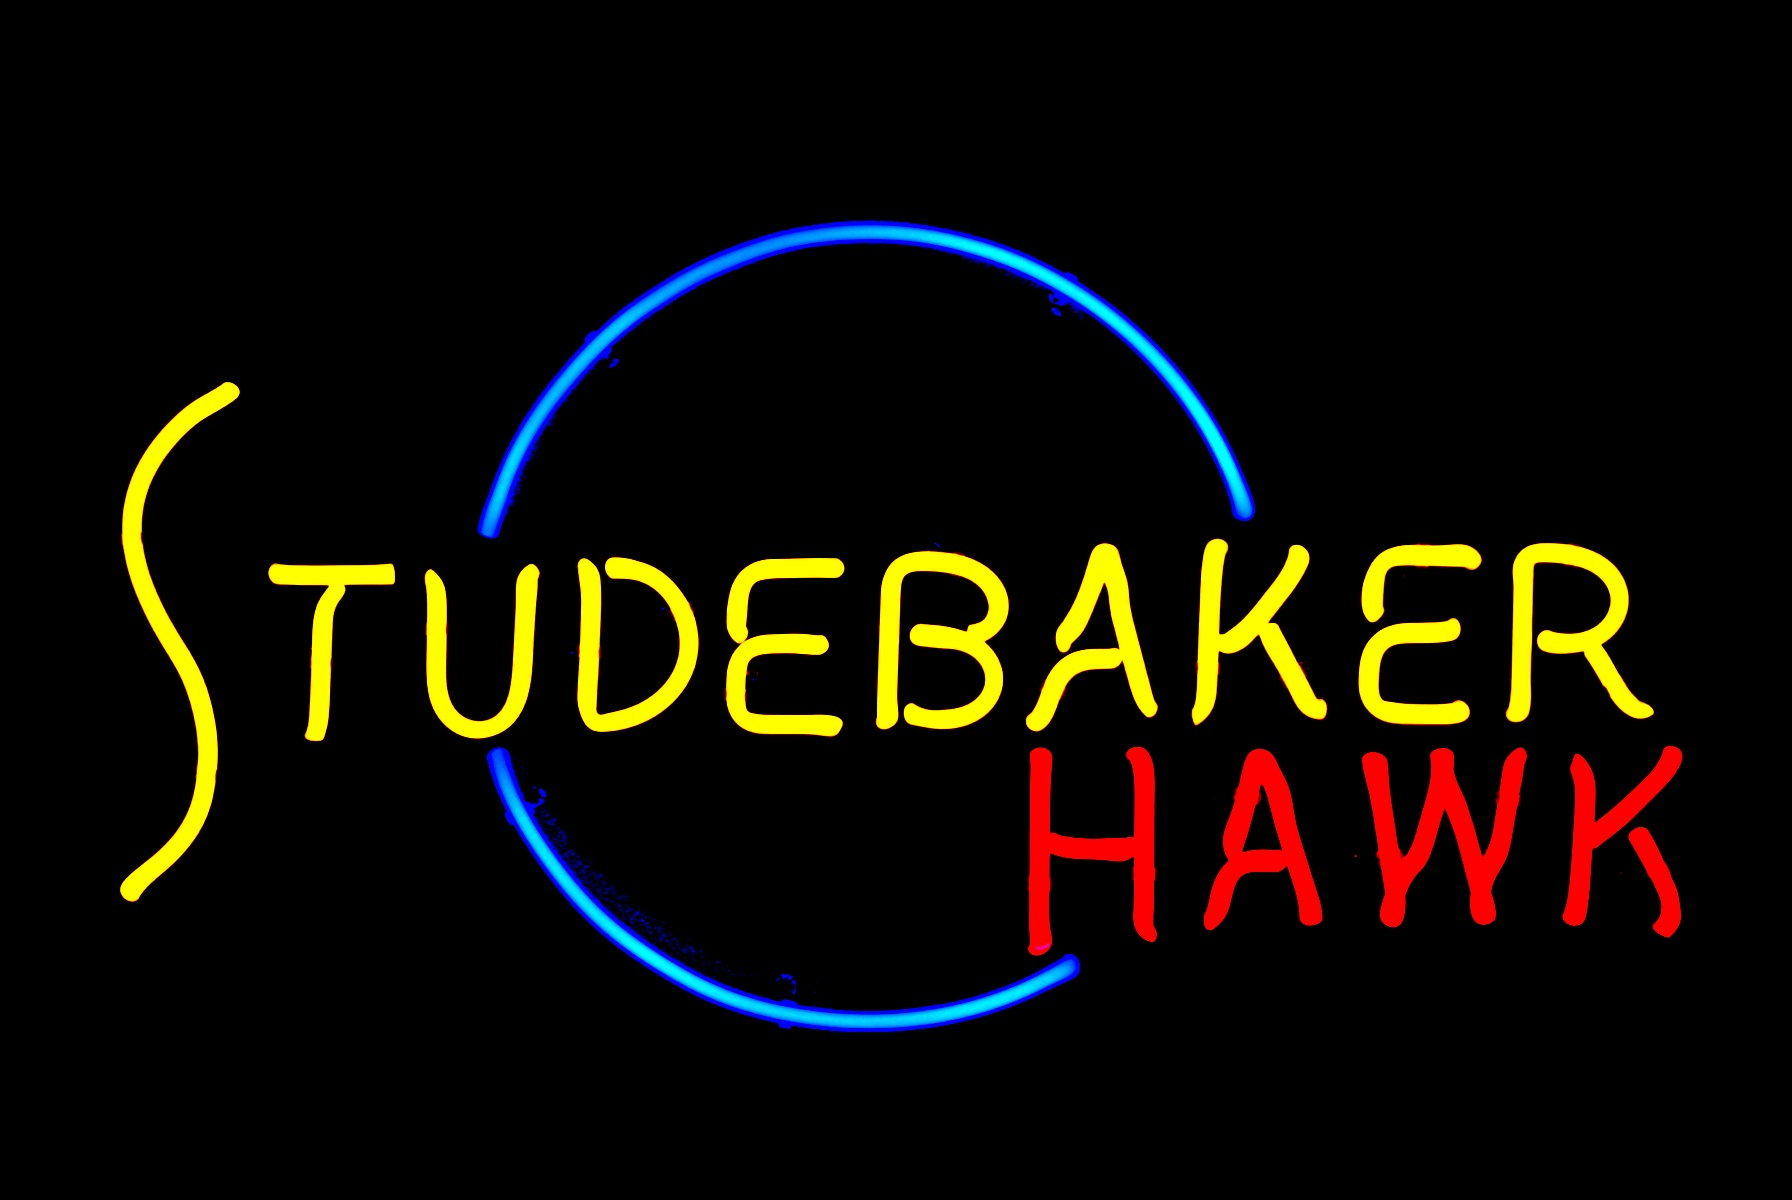 Studebaker Hawk Dealership Showroom Neon Sign by John Barton - former Studebaker Packard New Car Dealer - BartonNeonMagic.com